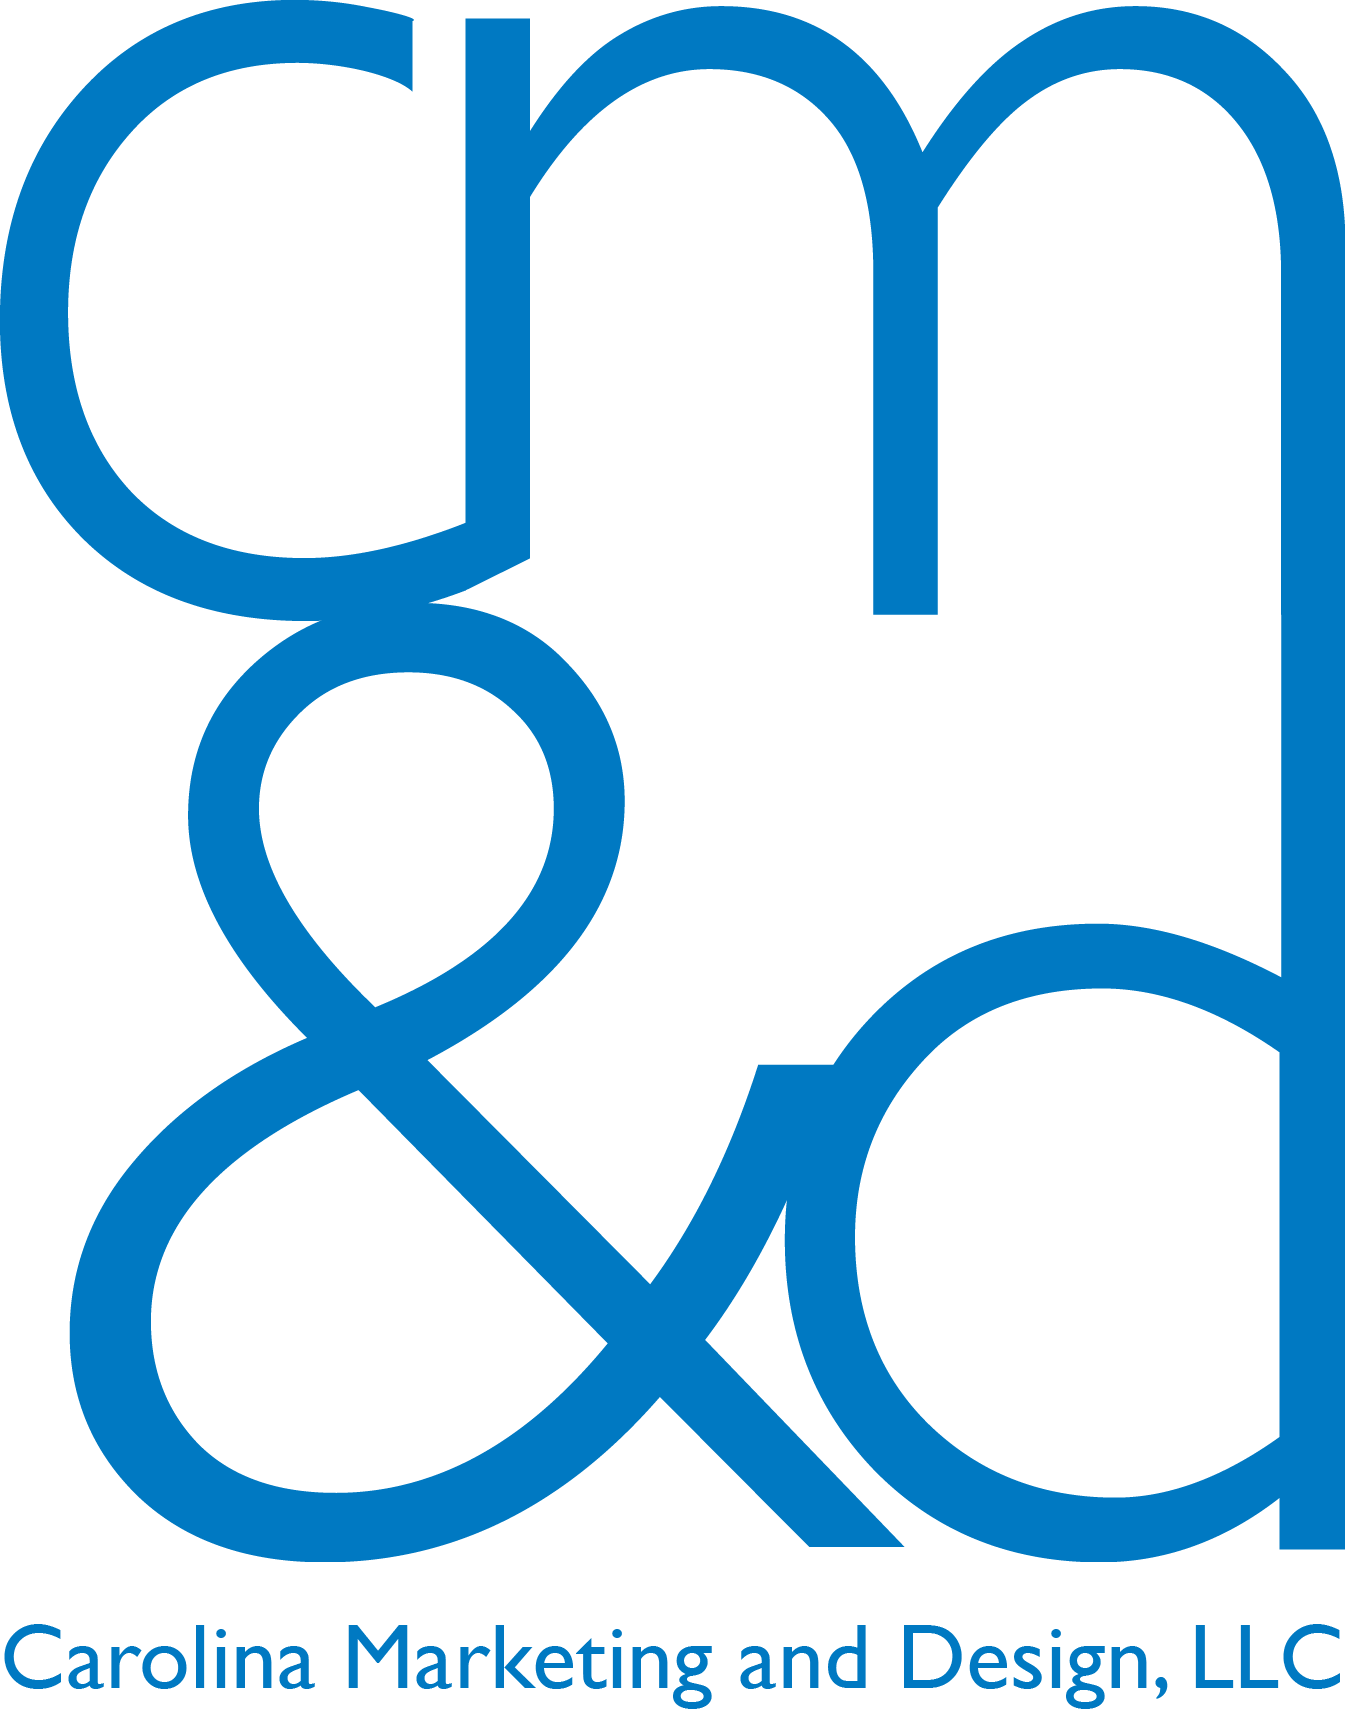 Carolina Marketing and Design - Foundation For Girls Corporate Sponsor